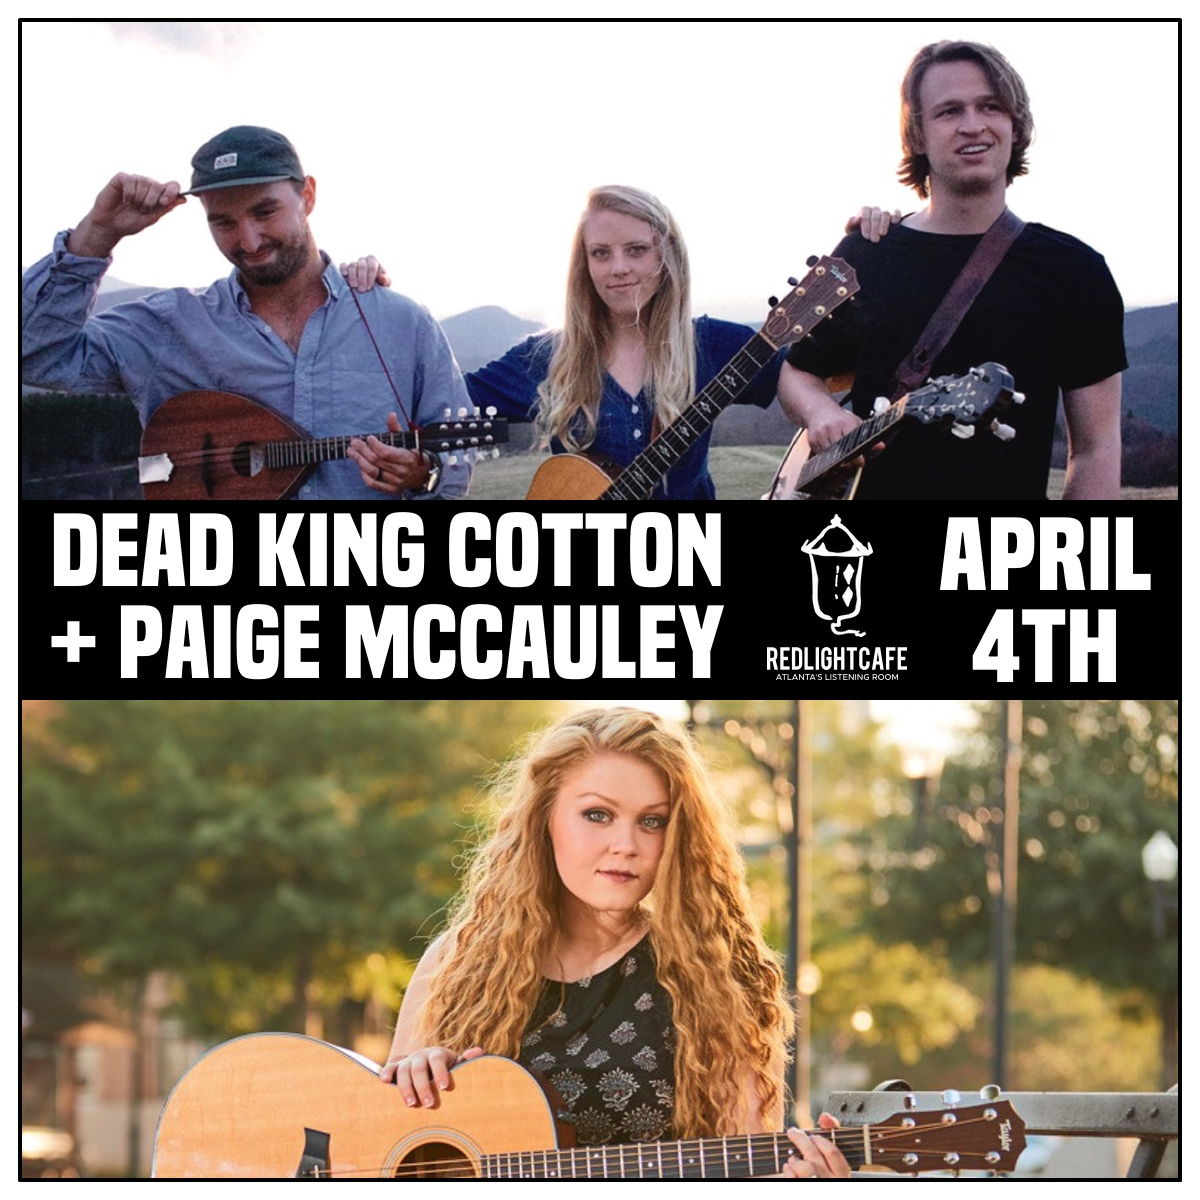 Dead King Cotton + Paige McCauley — April 4, 2019 — Red Light Café, Atlanta, GA